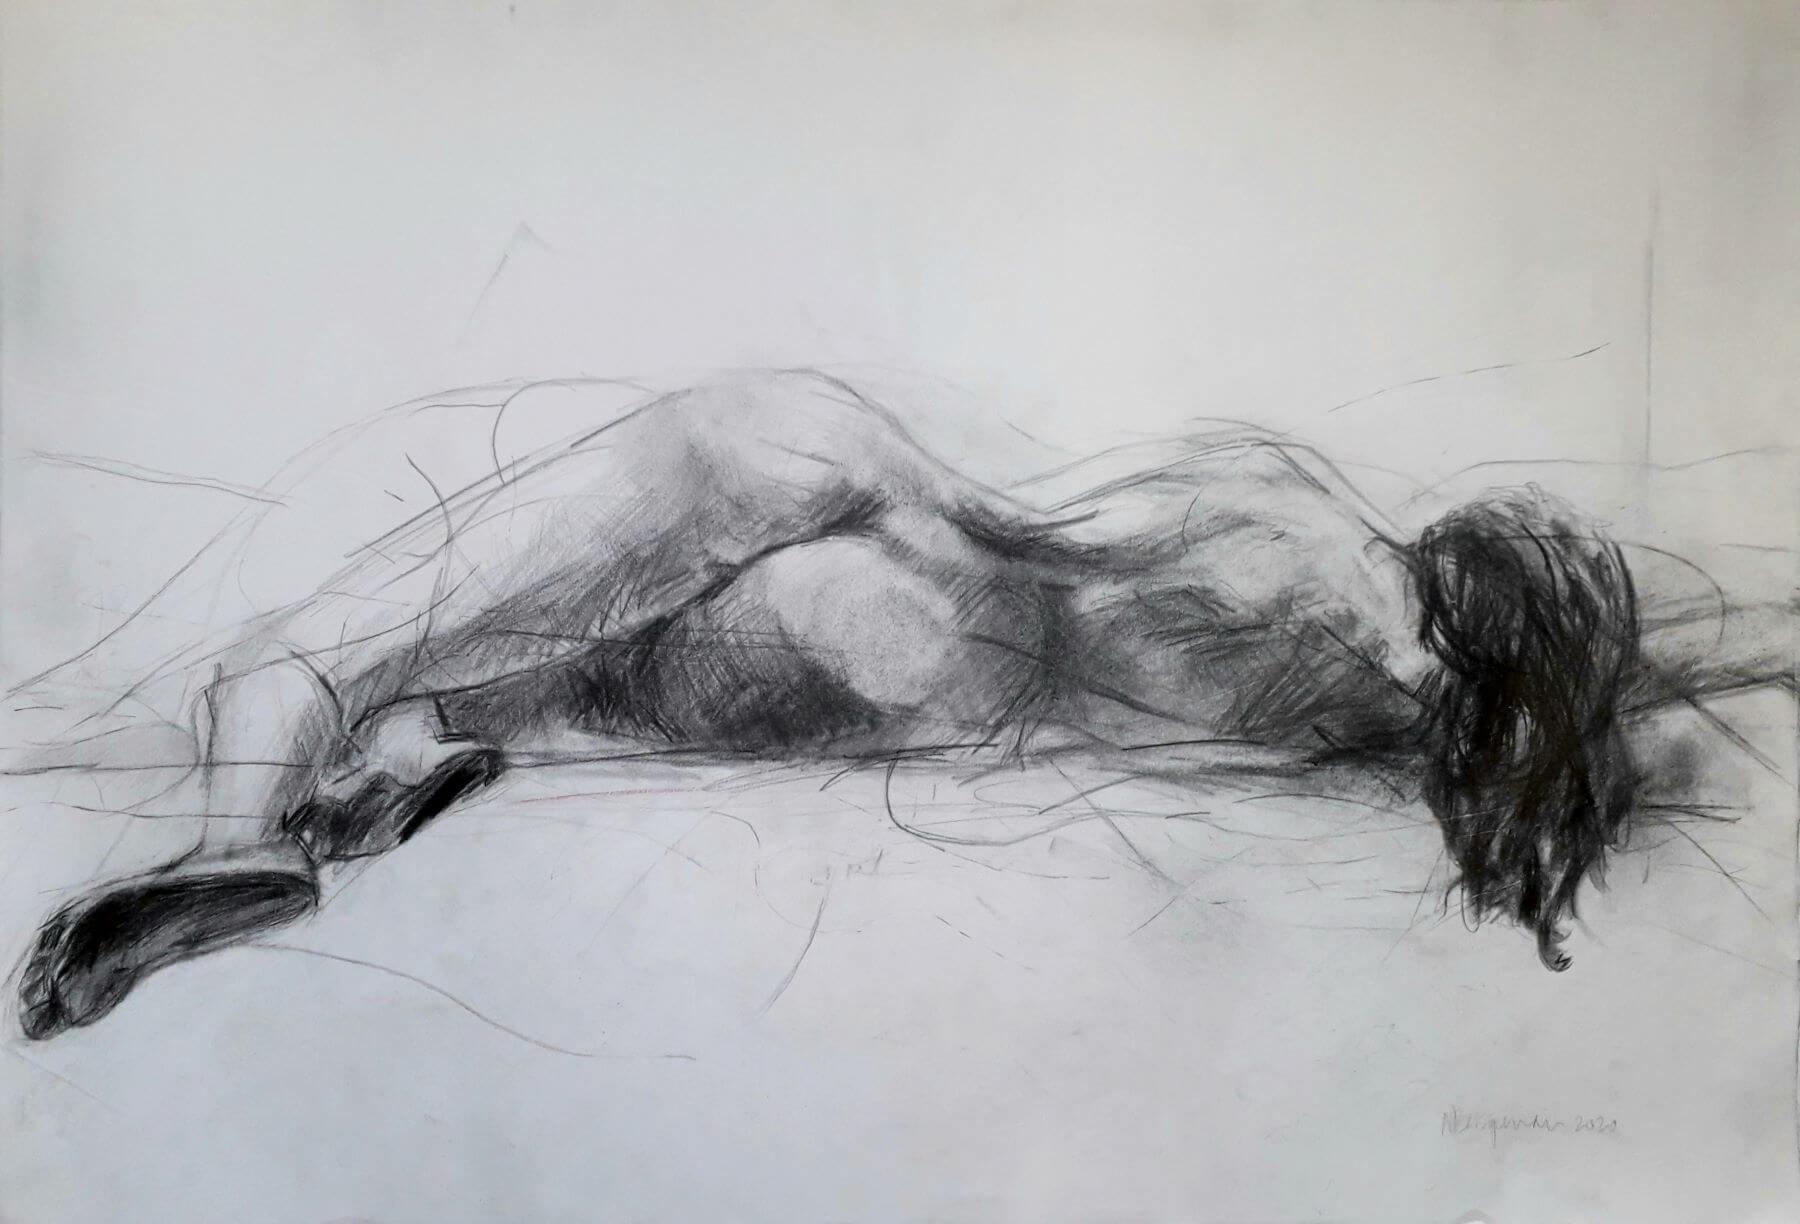 Natural - drawing, graphite on paper, by artist Neva Bergemann